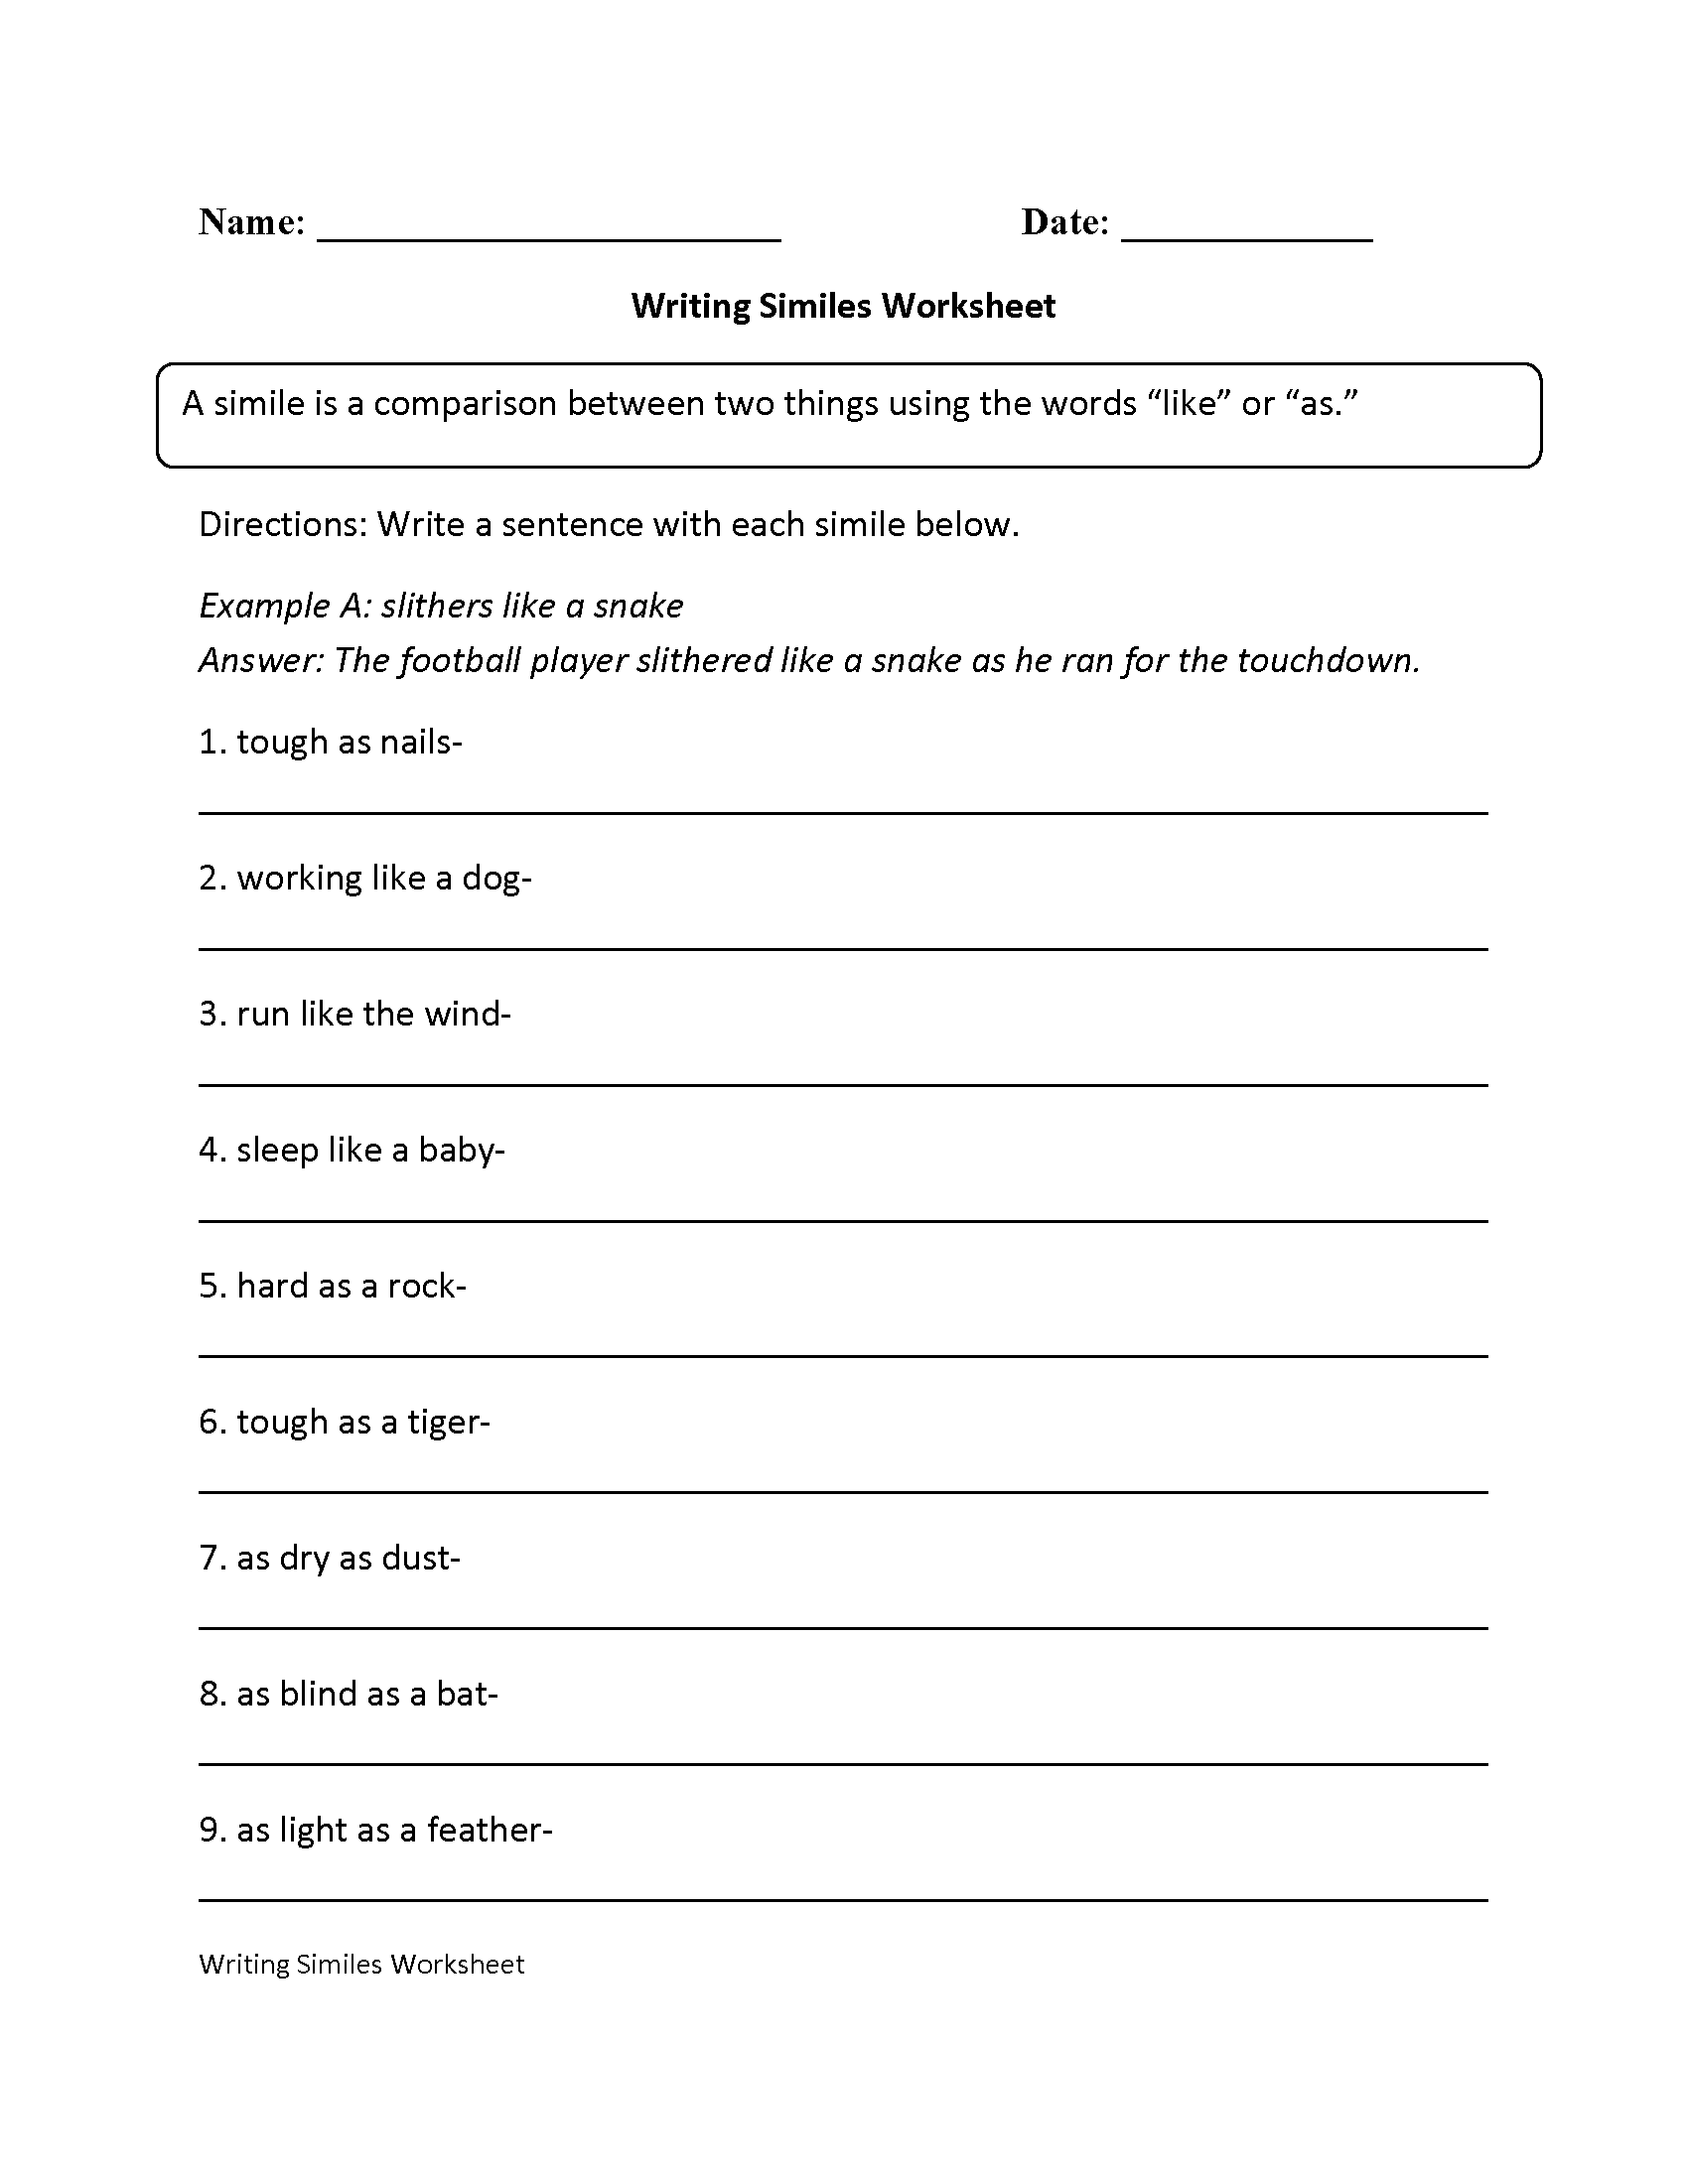 Similes Worksheet 4th Grade The Best Worksheets Image